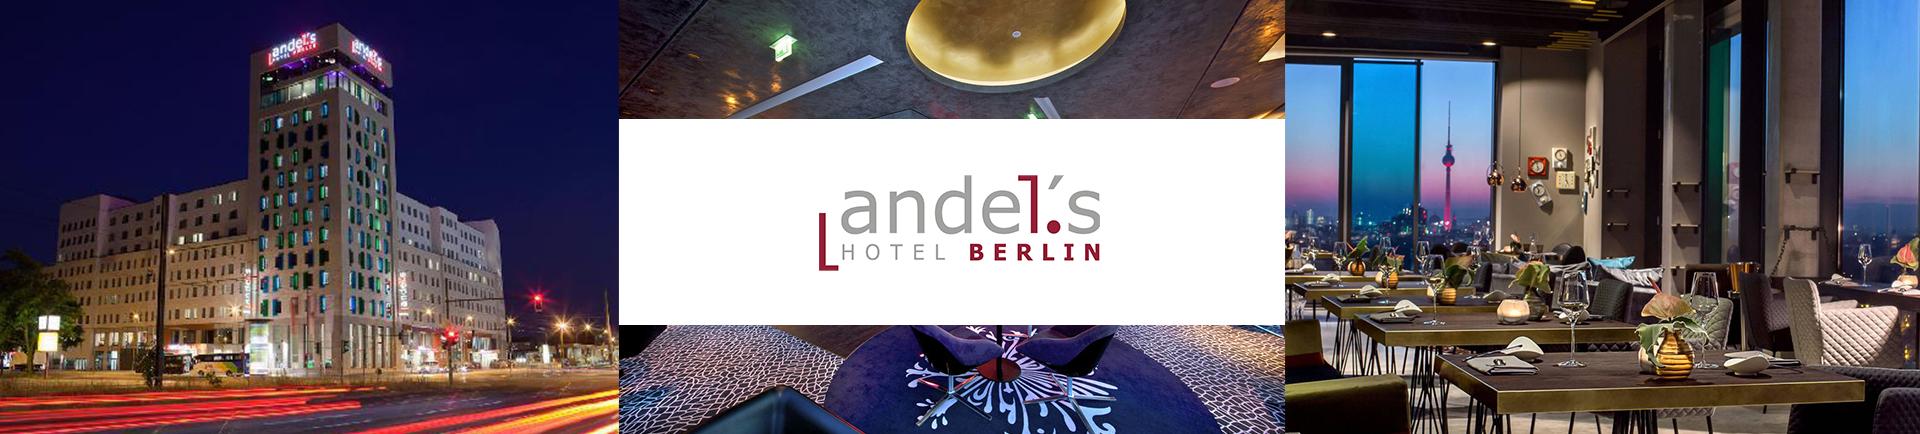 Vienna Andels House Berlin - Home